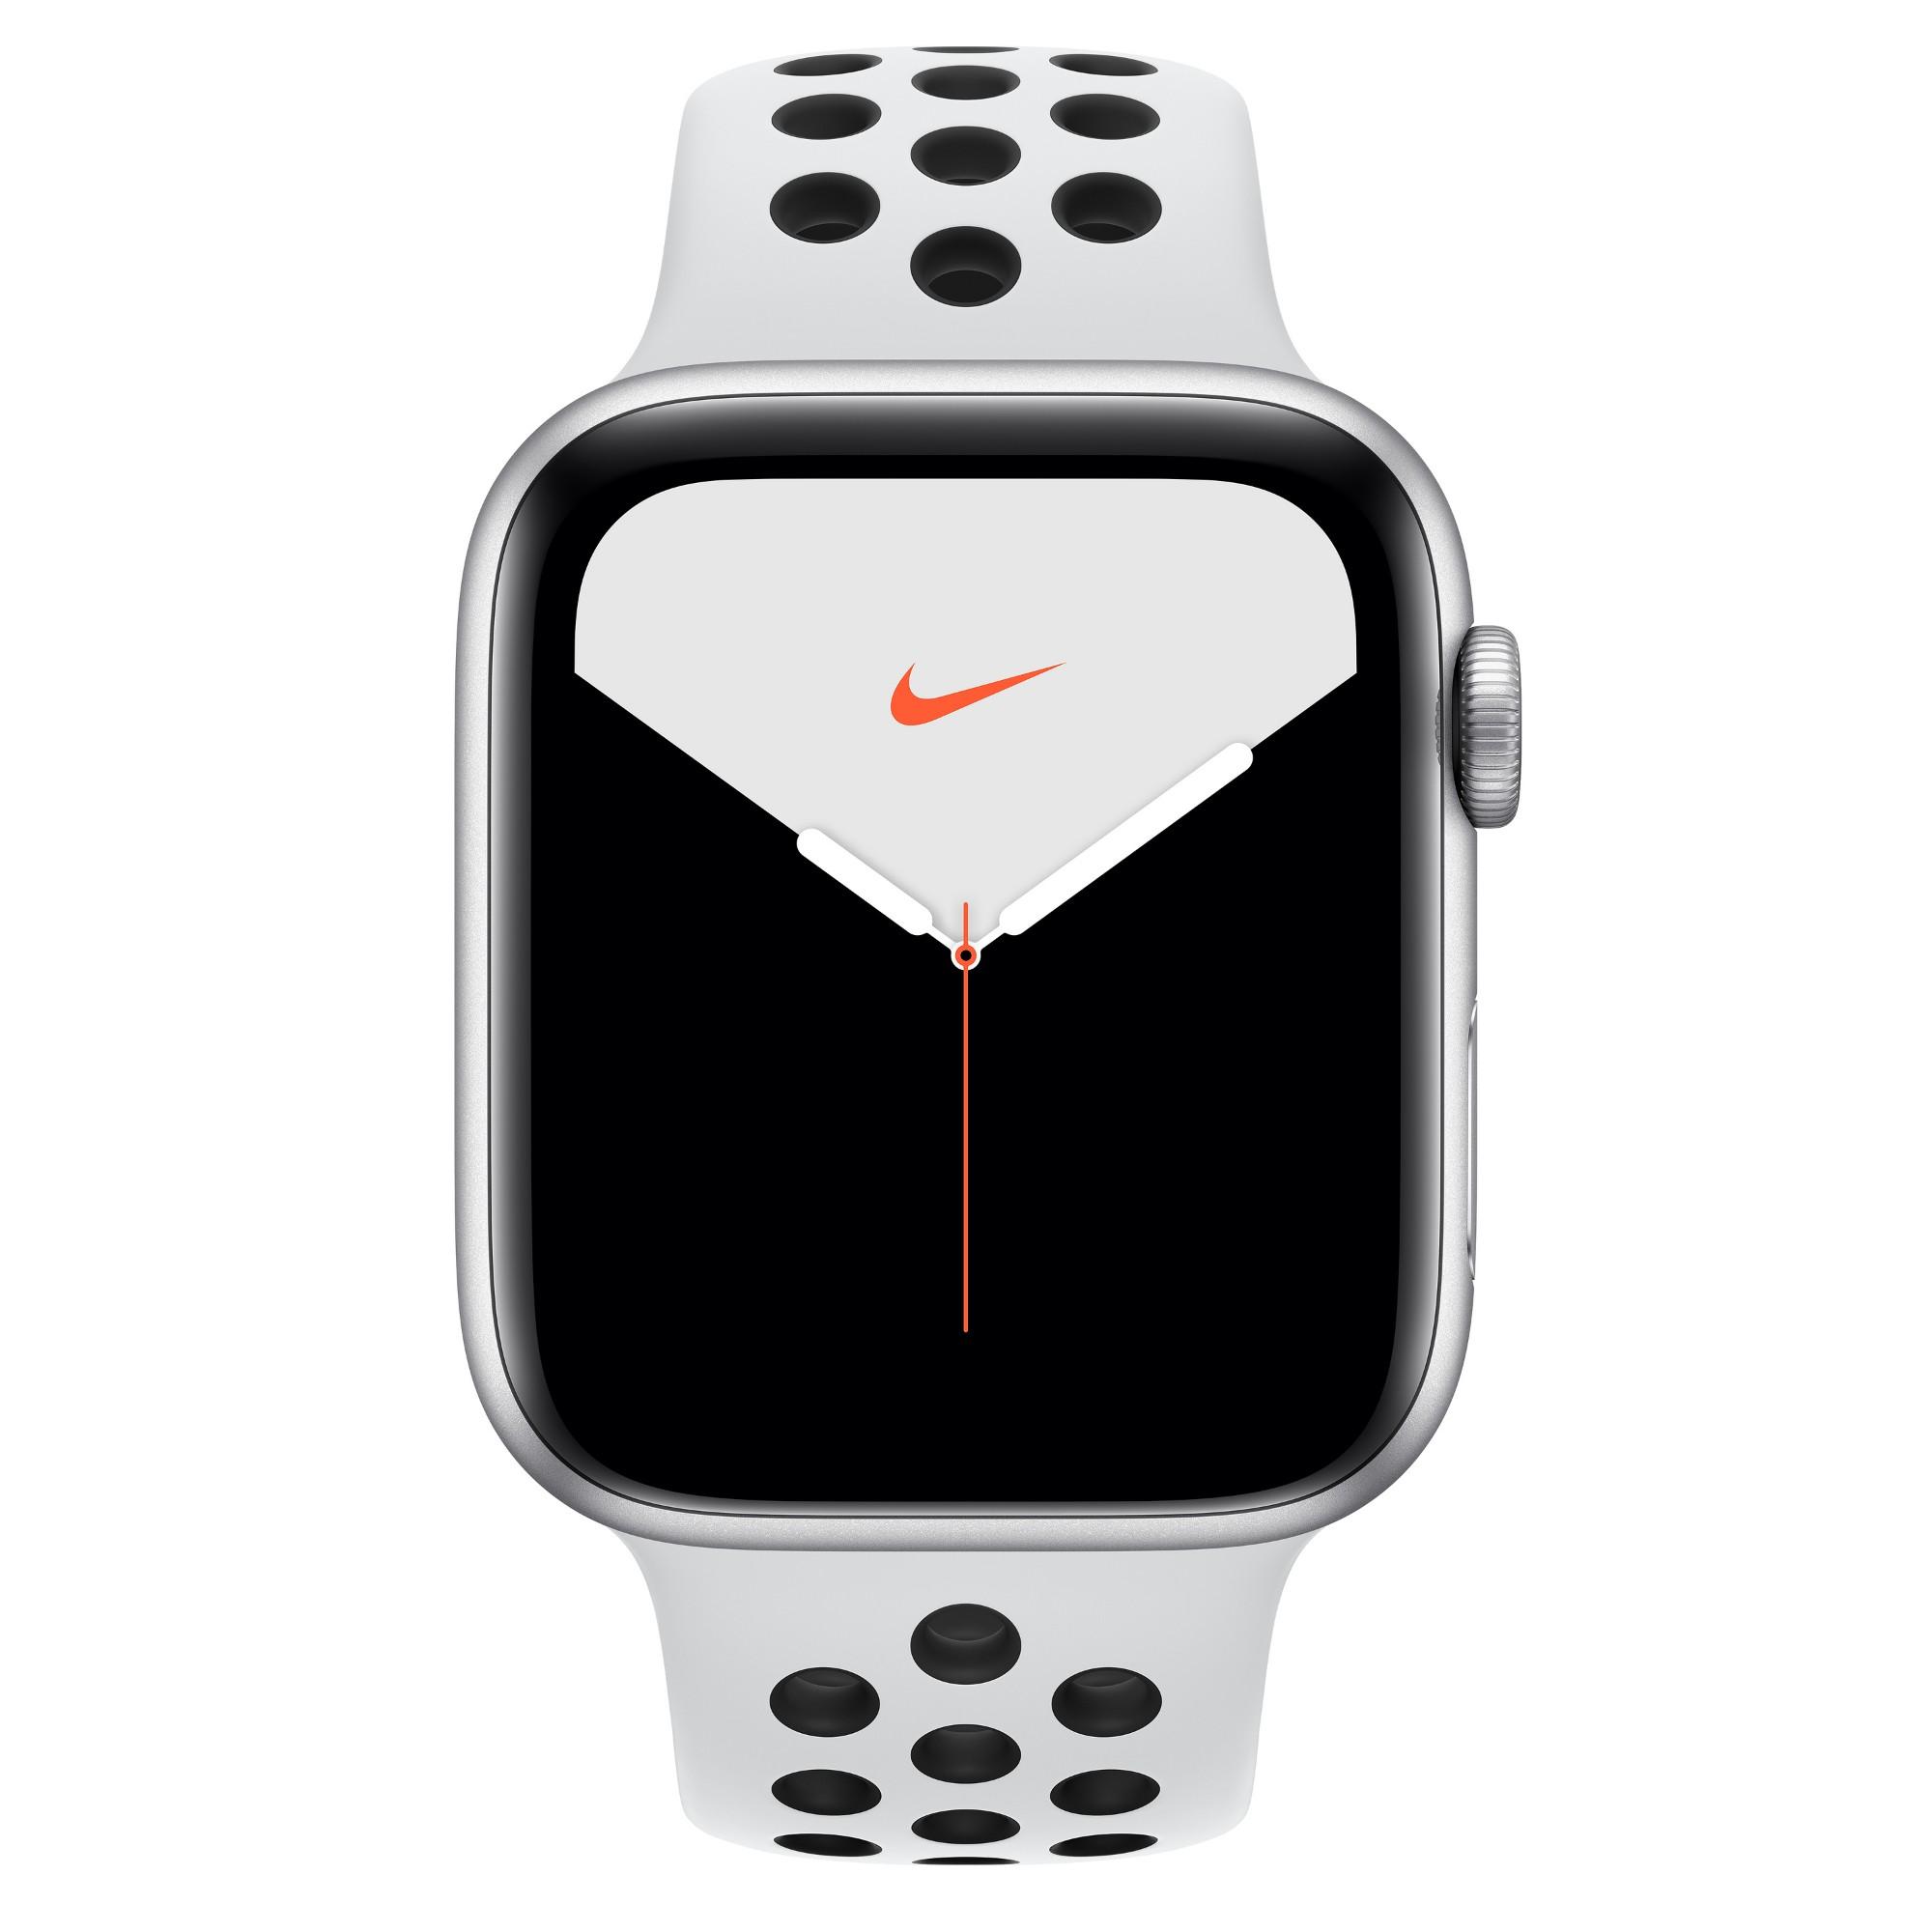 Apple Watch Nike Series 5 smartwatch Silver OLED Cellular GPS satellite